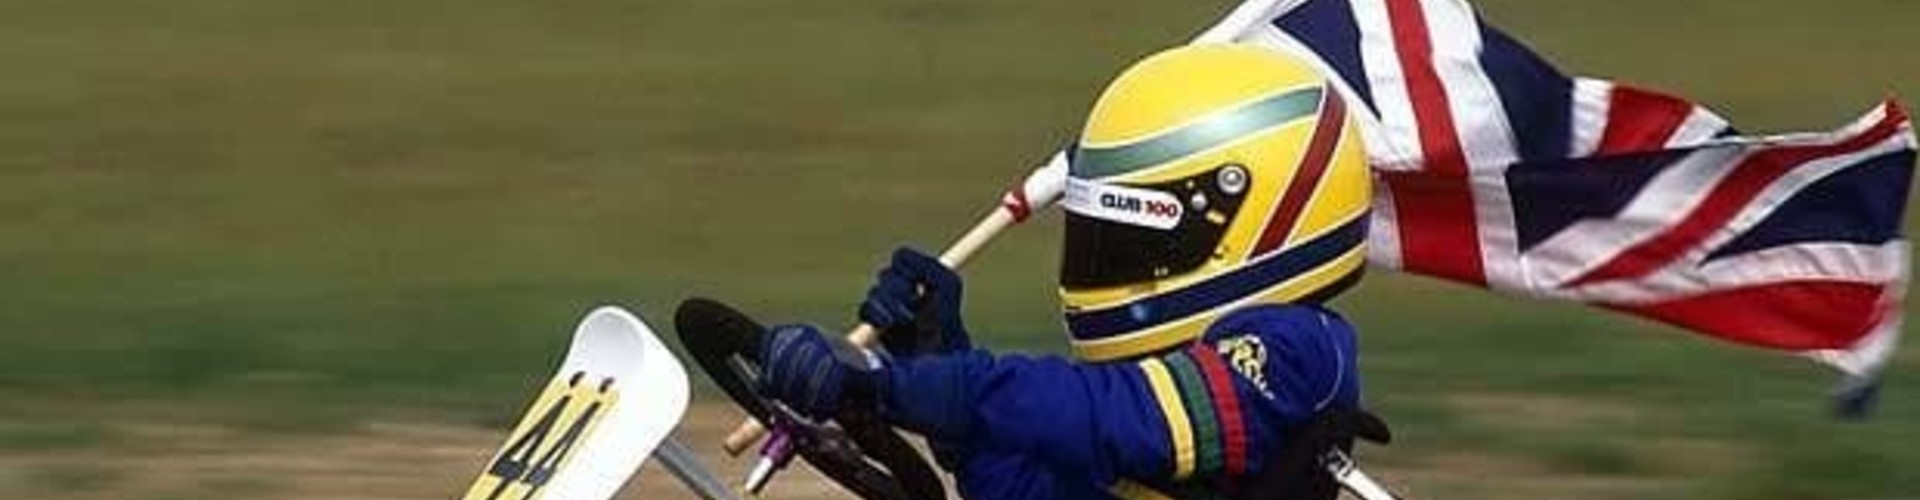 Lewis Hamilton wereldkampioen formule 1 2018